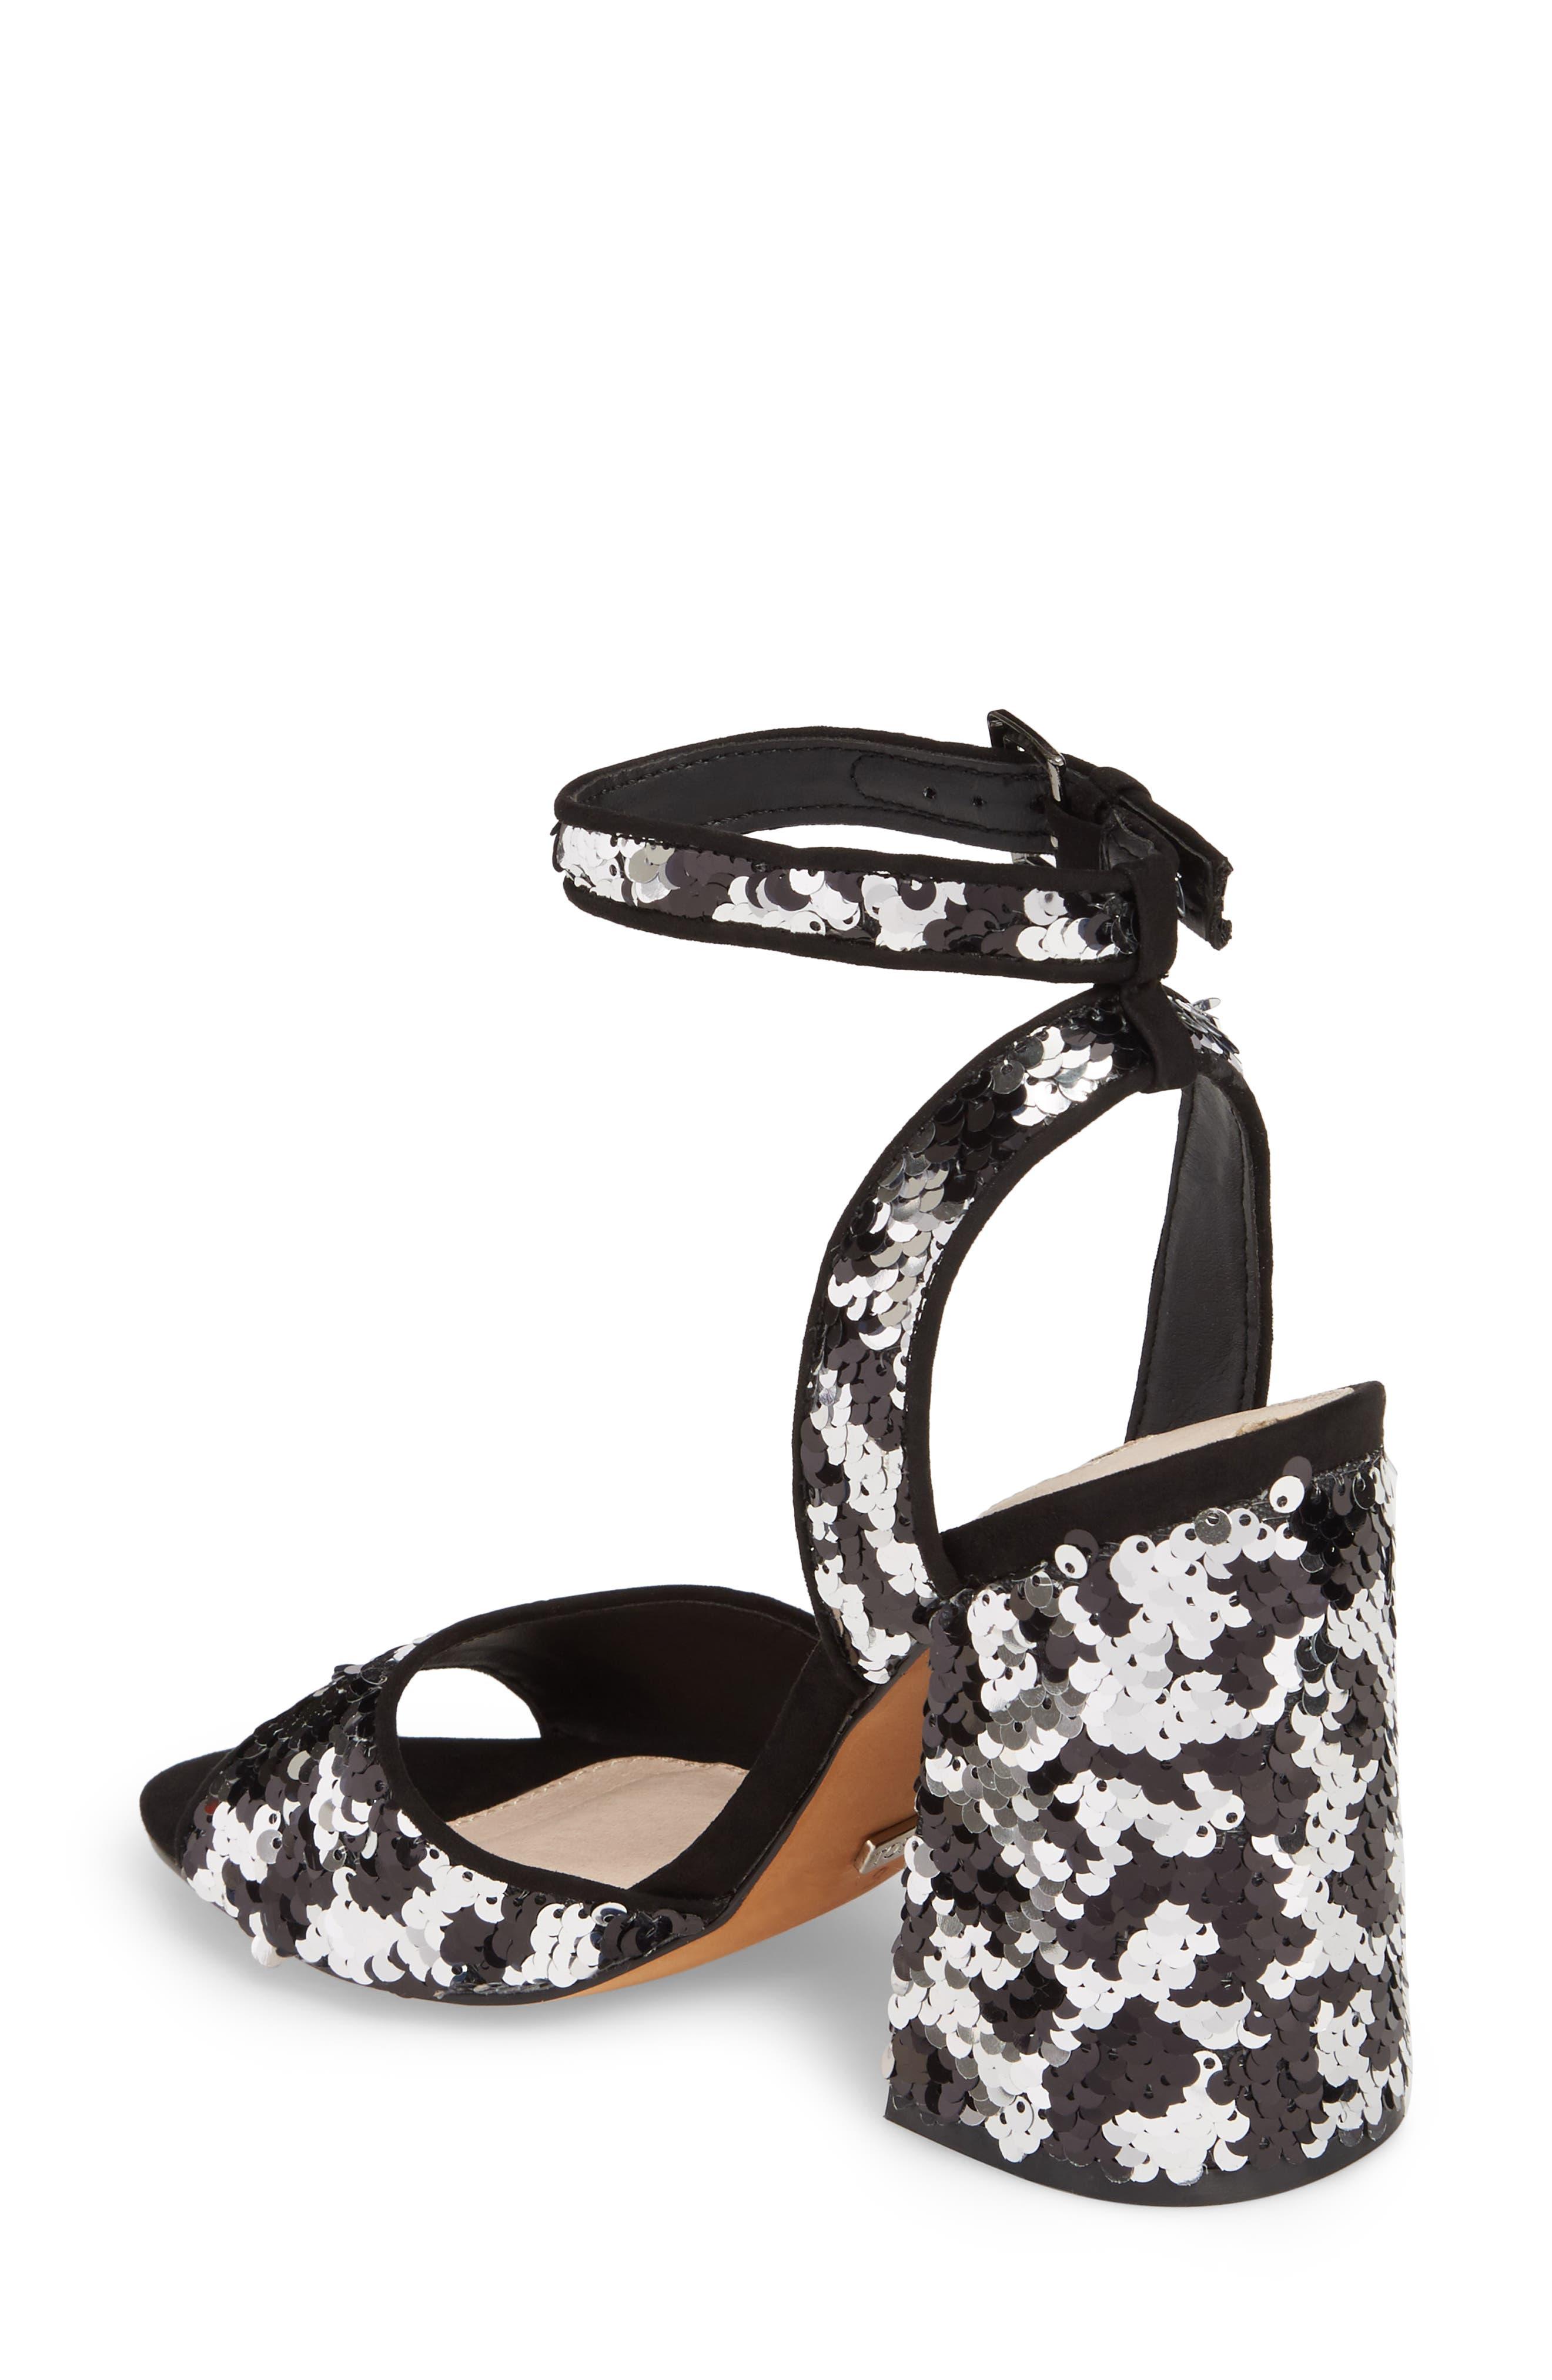 Reaction Sequin Block Heel Sandal,                             Alternate thumbnail 2, color,                             Black Multi